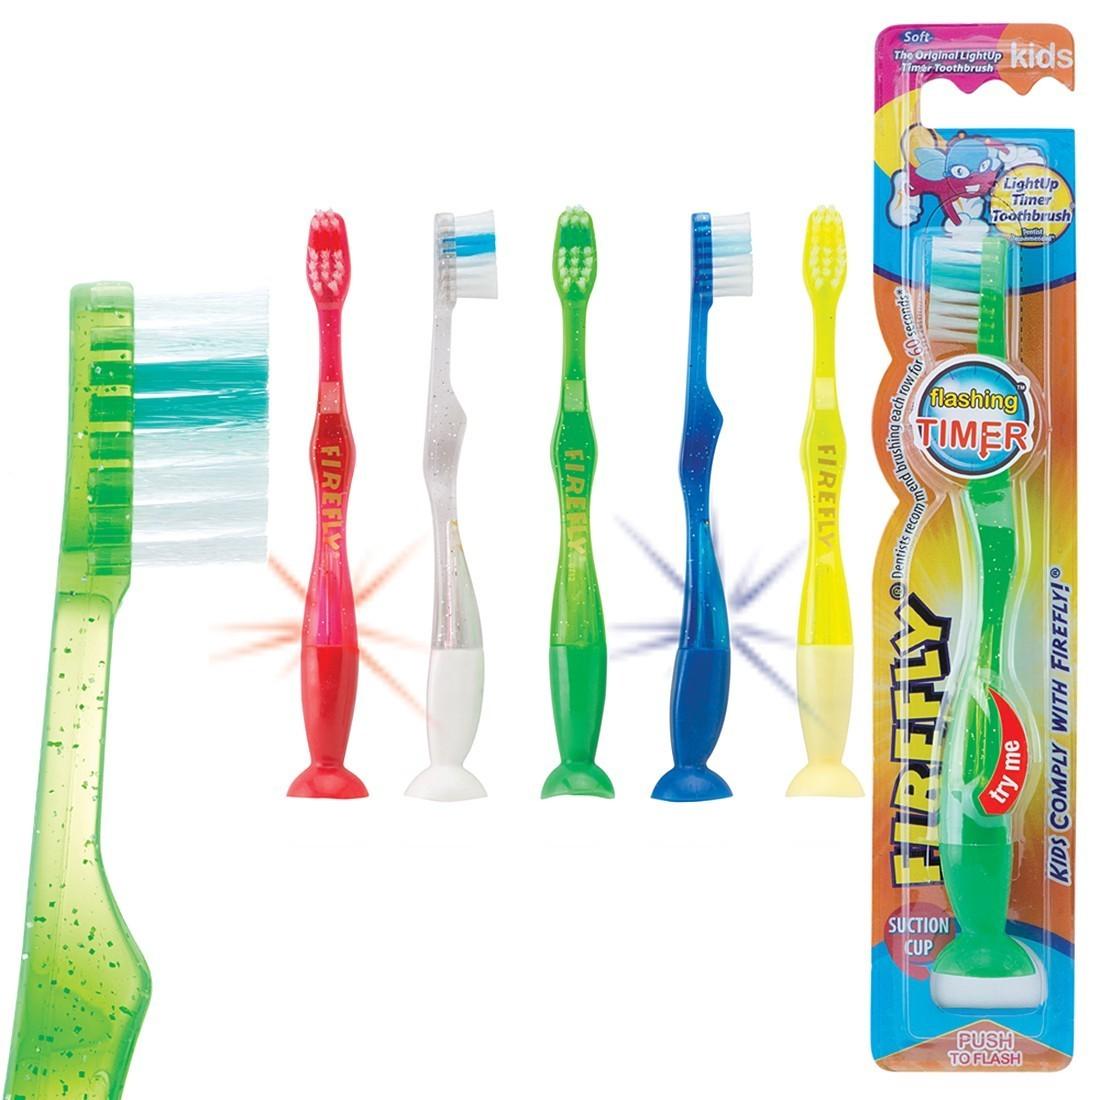 Firefly Youth Flashing Suction Toothbrushes [image]